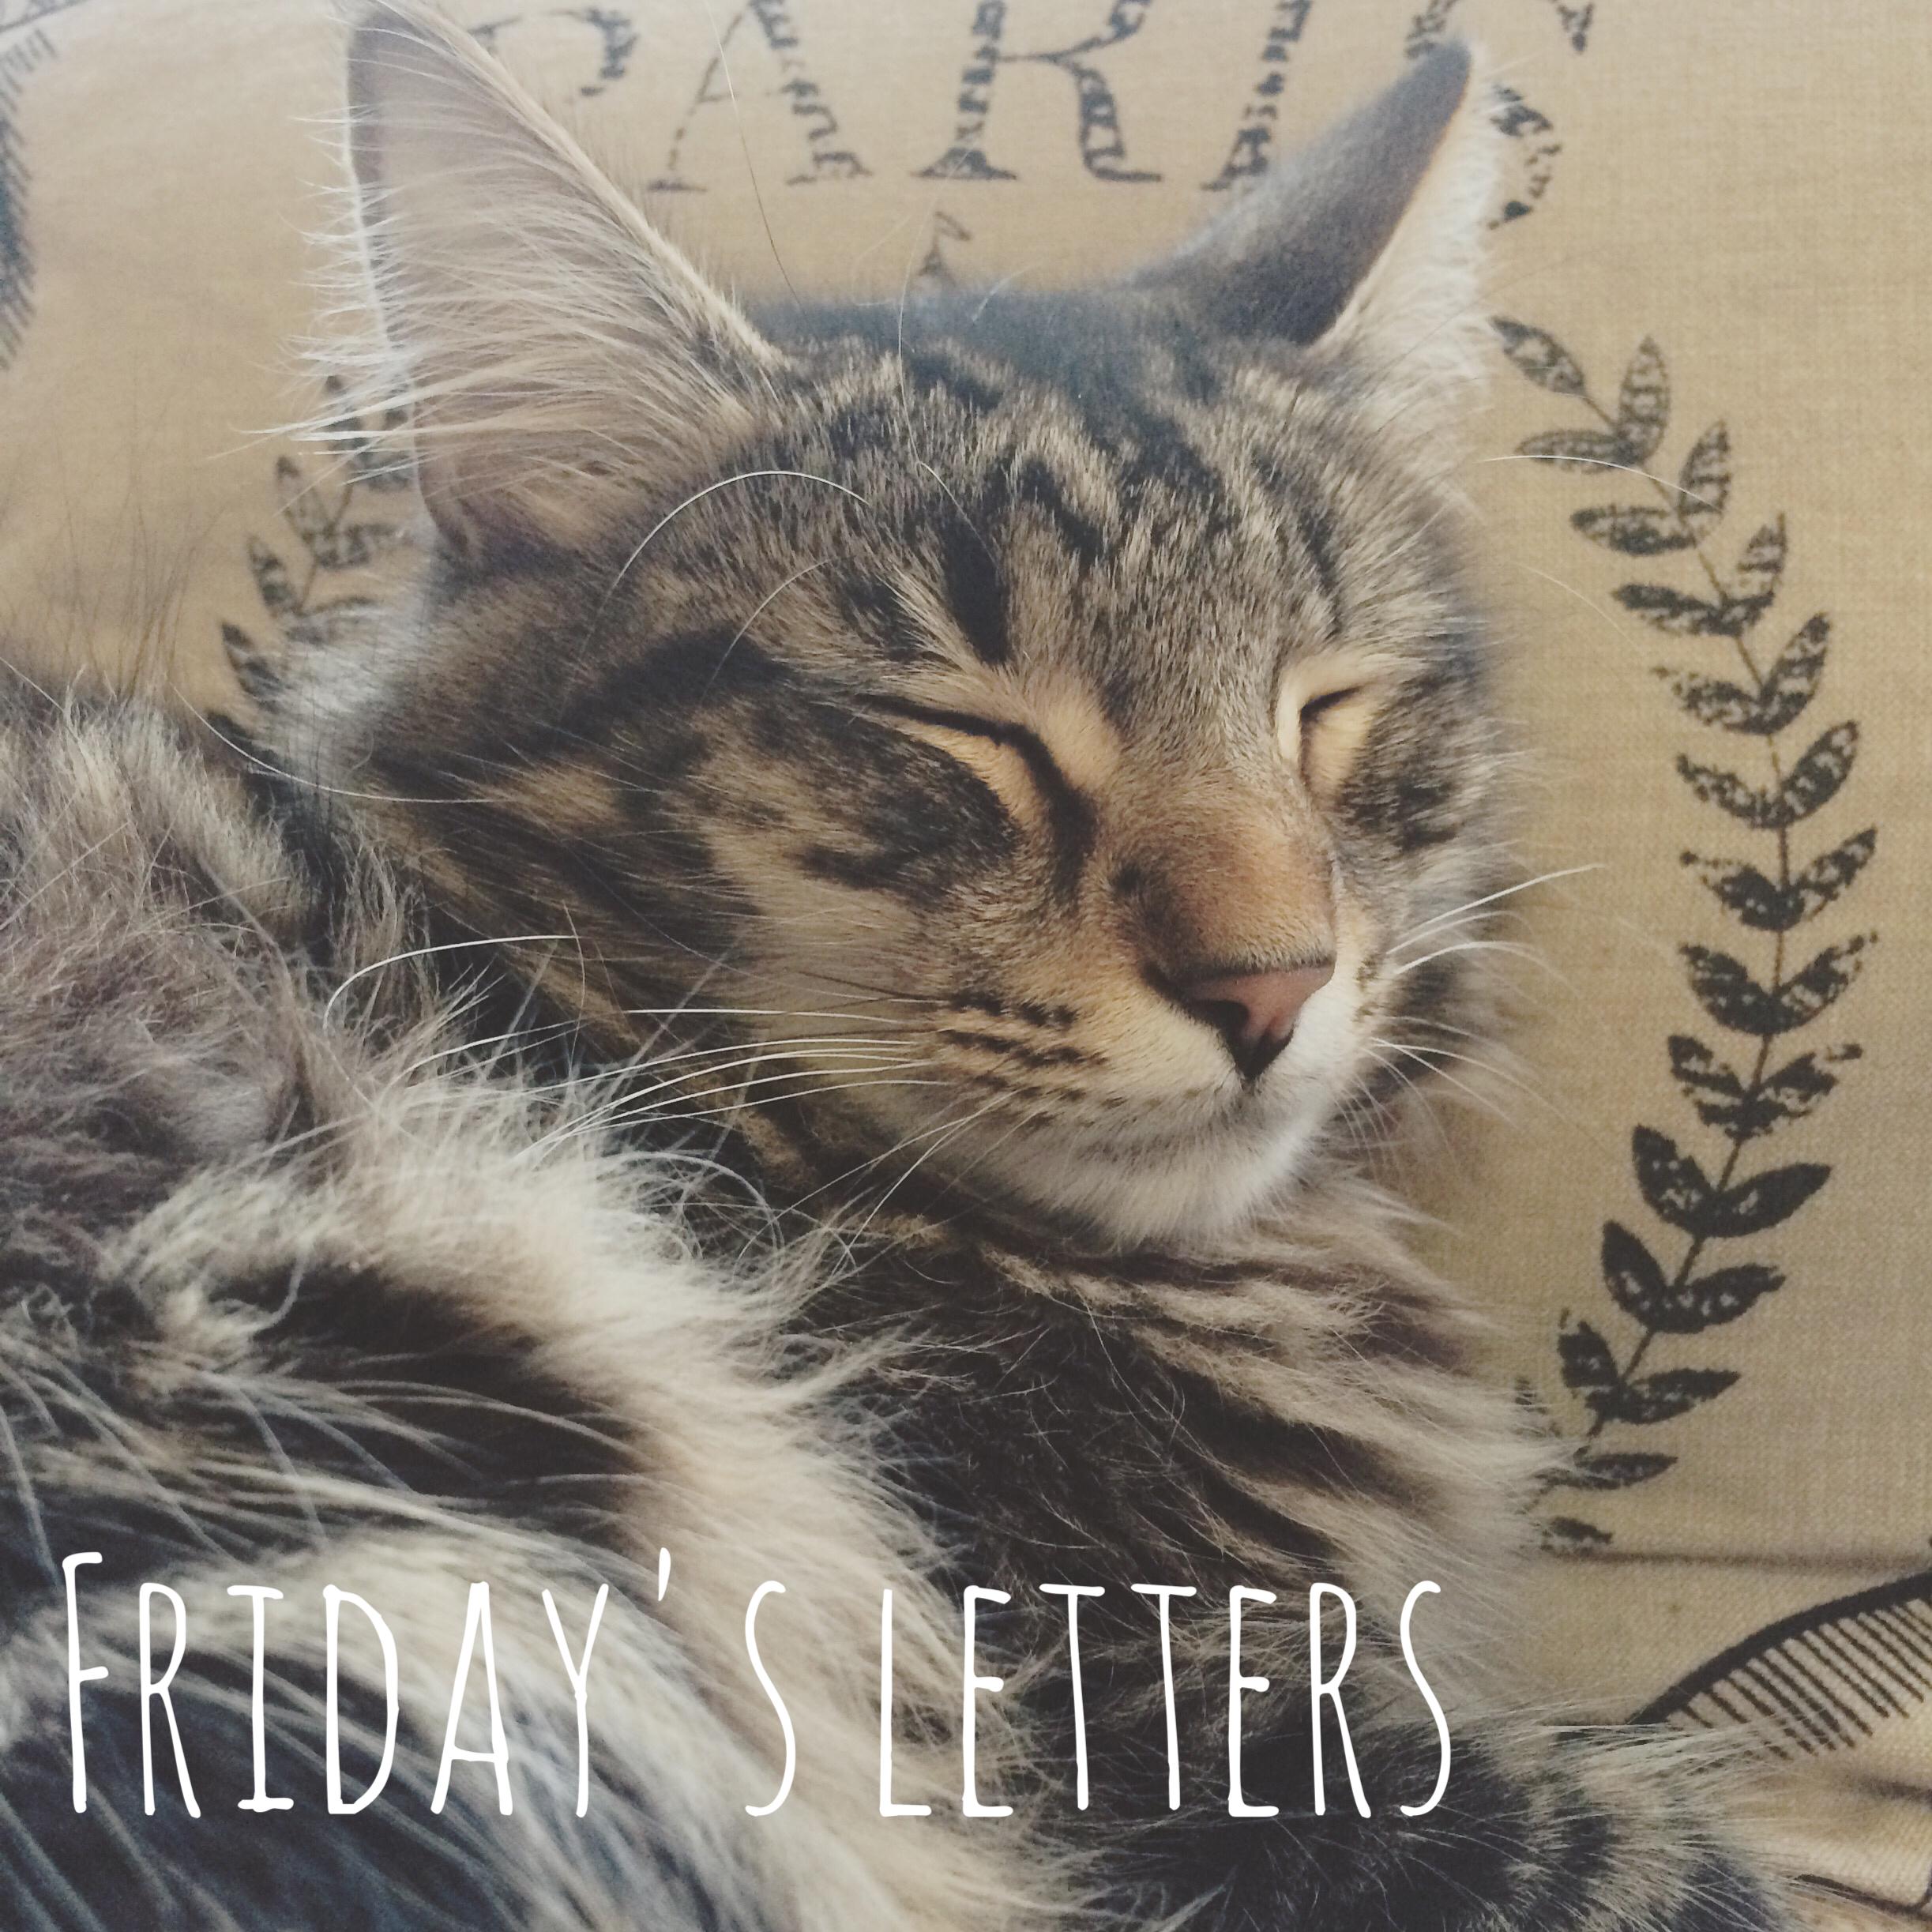 Friday's Letters myfoxycorner